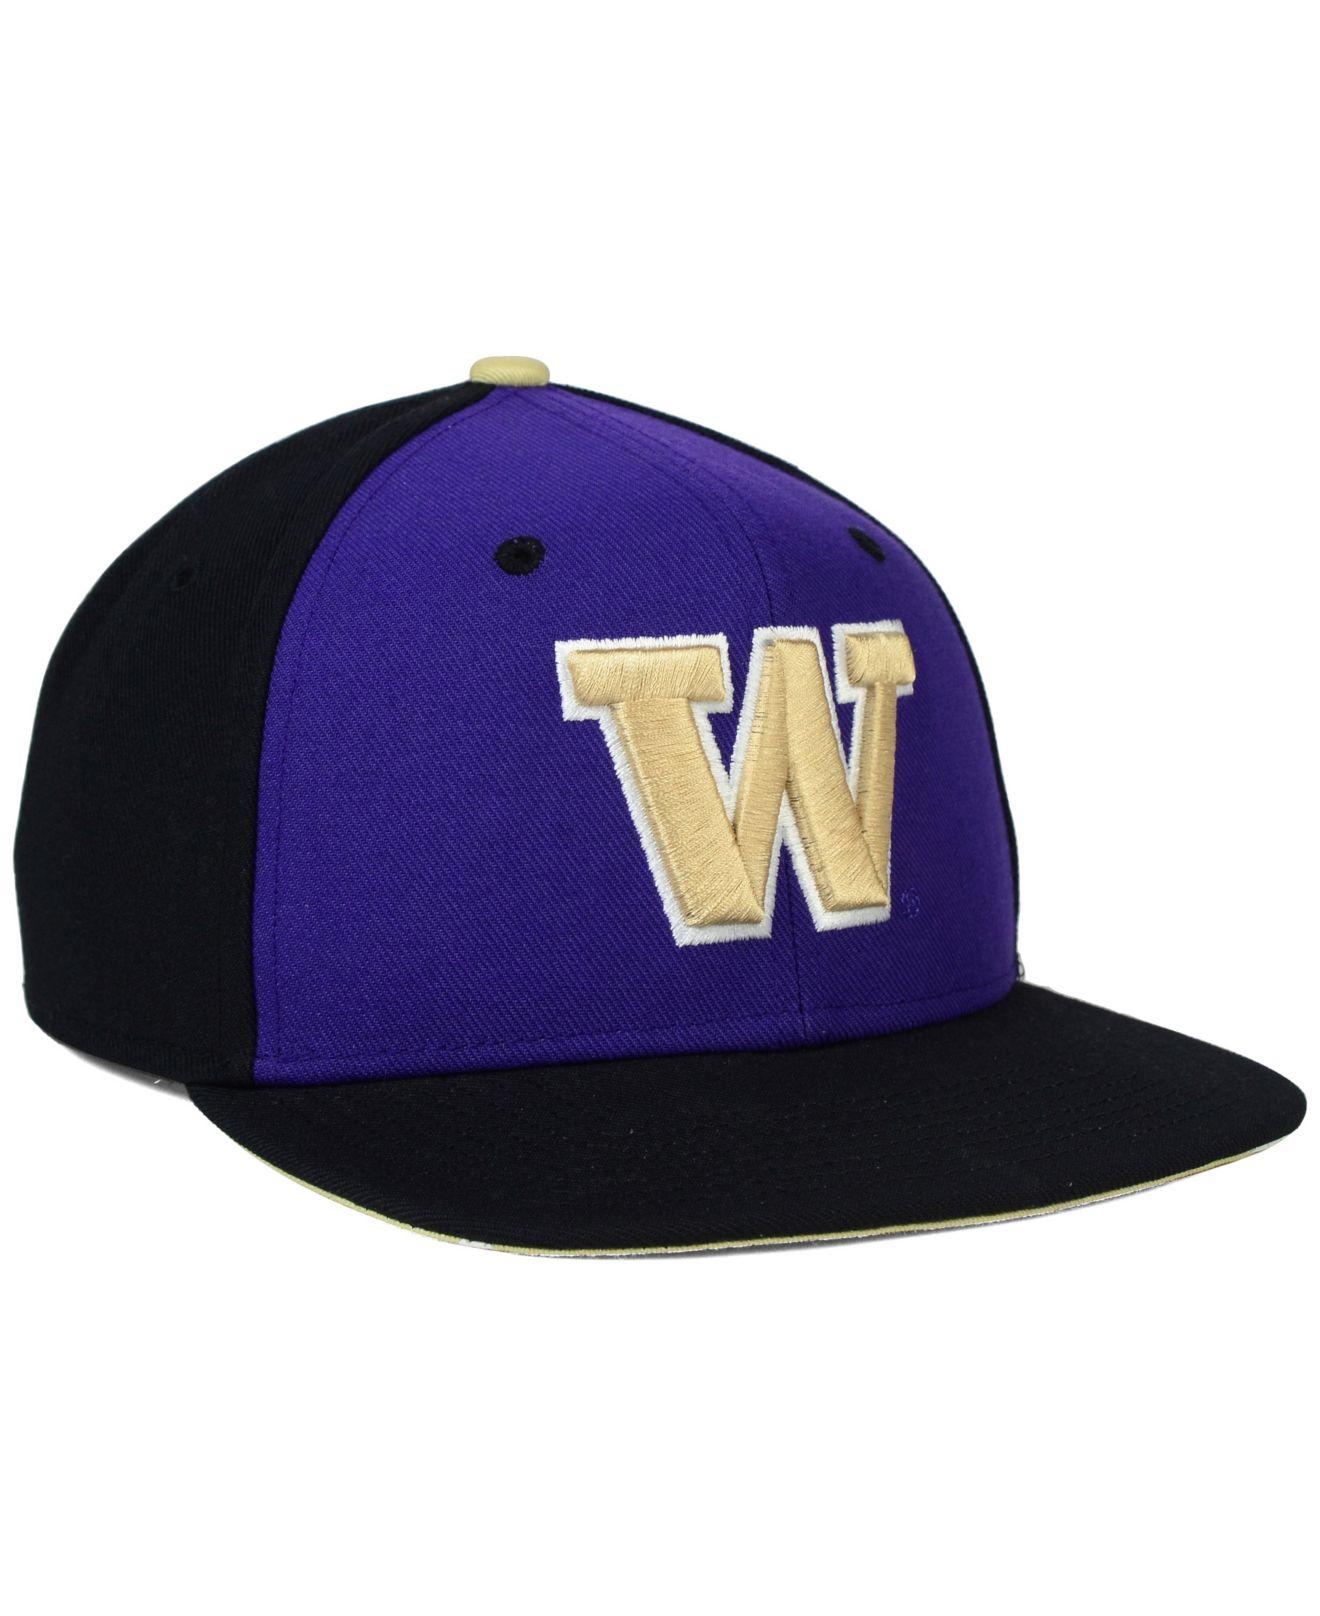 online store 6b426 8944d Nike Washington Huskies Pro Verbiage Snapback Cap in Purple for Men ...